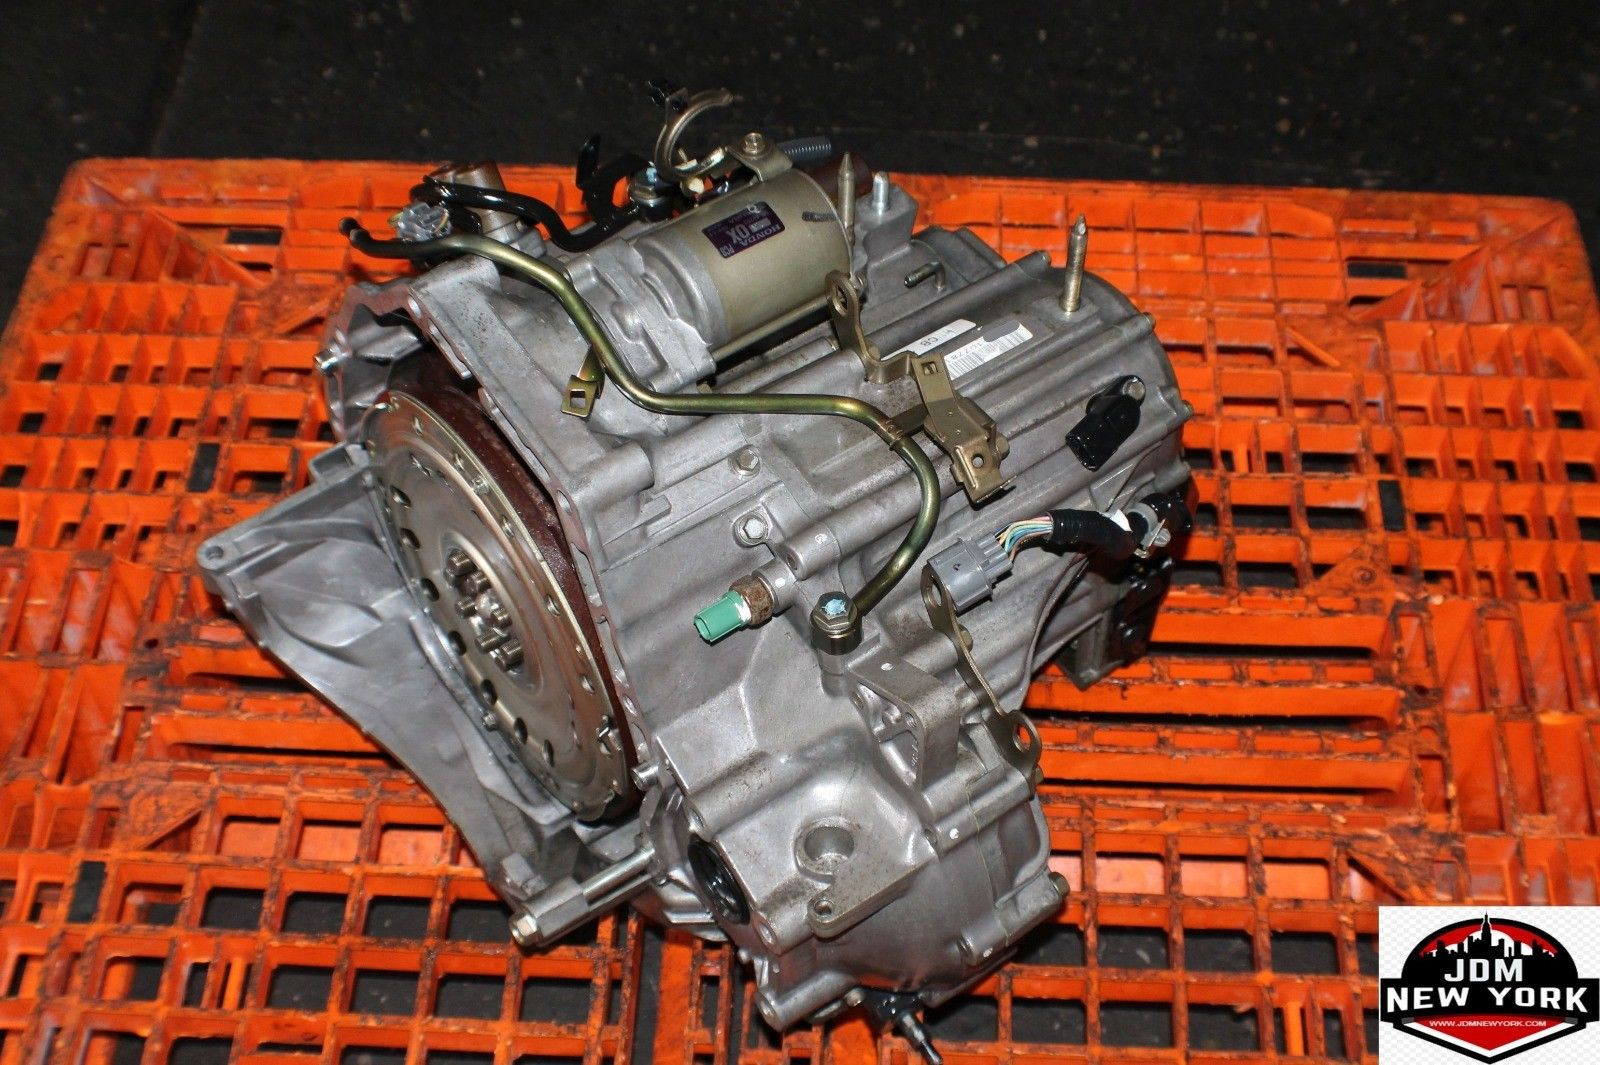 [SCHEMATICS_44OR]  1998-2002 HONDA ACCORD 2.3L 4-CYLINDER AUTOMATIC TRANSMISSION JDM F23A MCJA  MGPA | JDM New York | 98 Accord 4 Cyl Engine Diagram |  | JDM New York